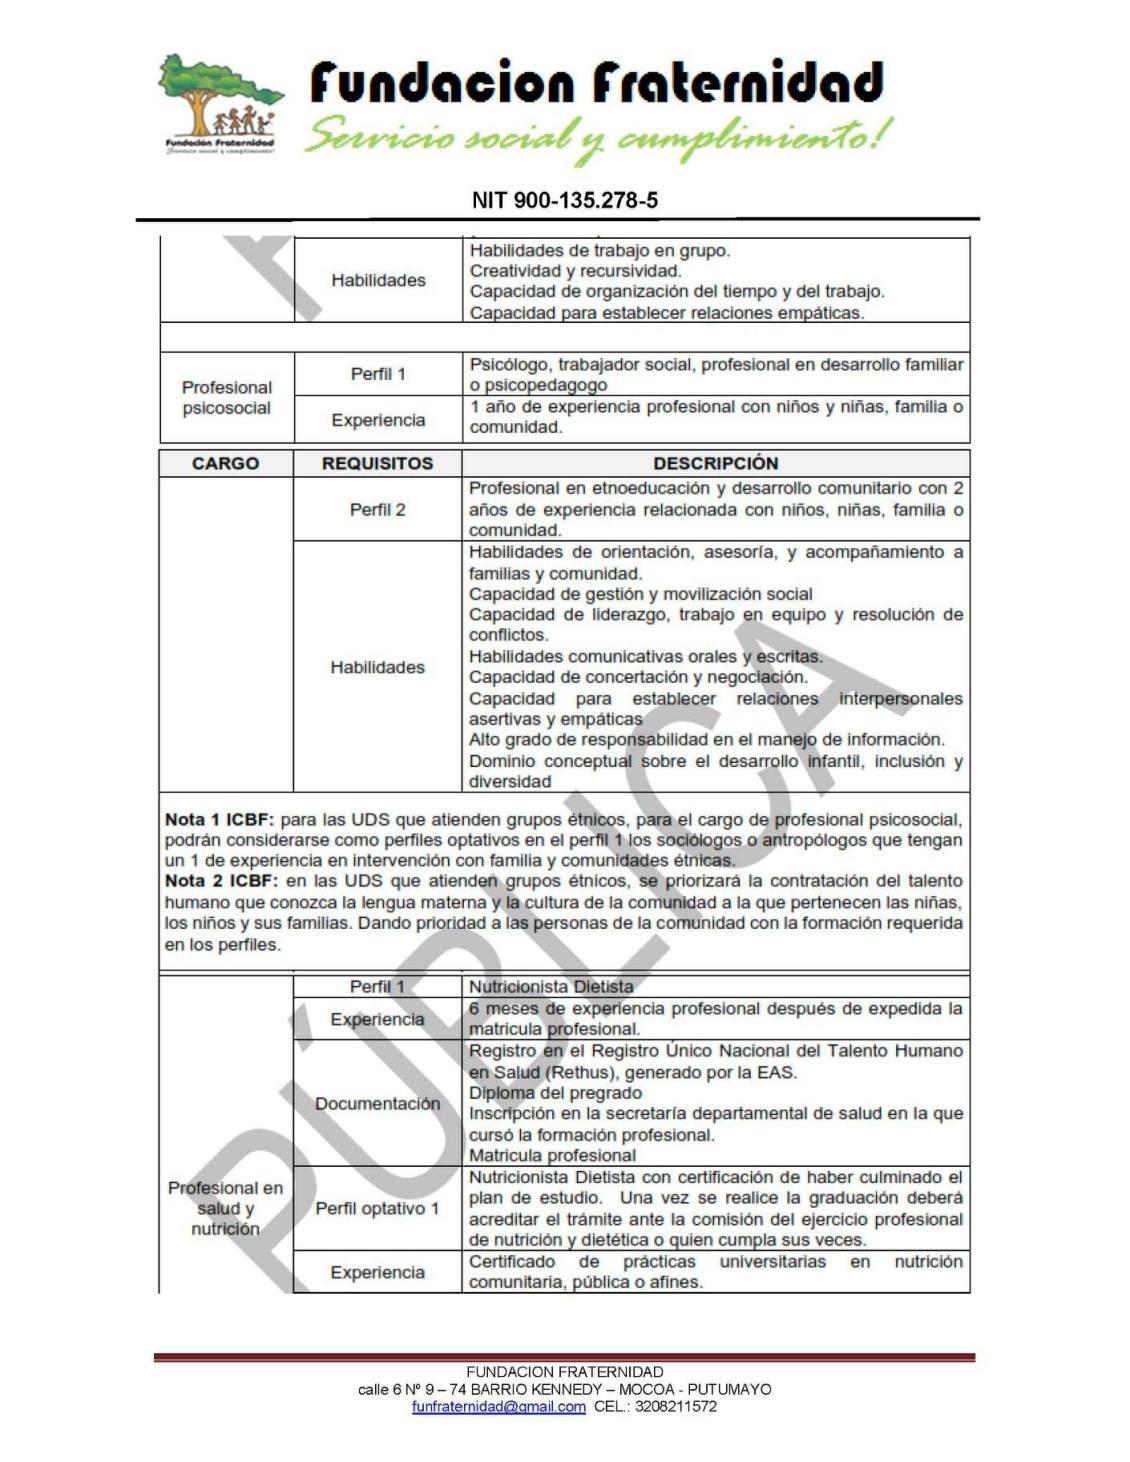 fundacion-fraternidad-abre-convocatoria-laboral-nro-002-2021-3